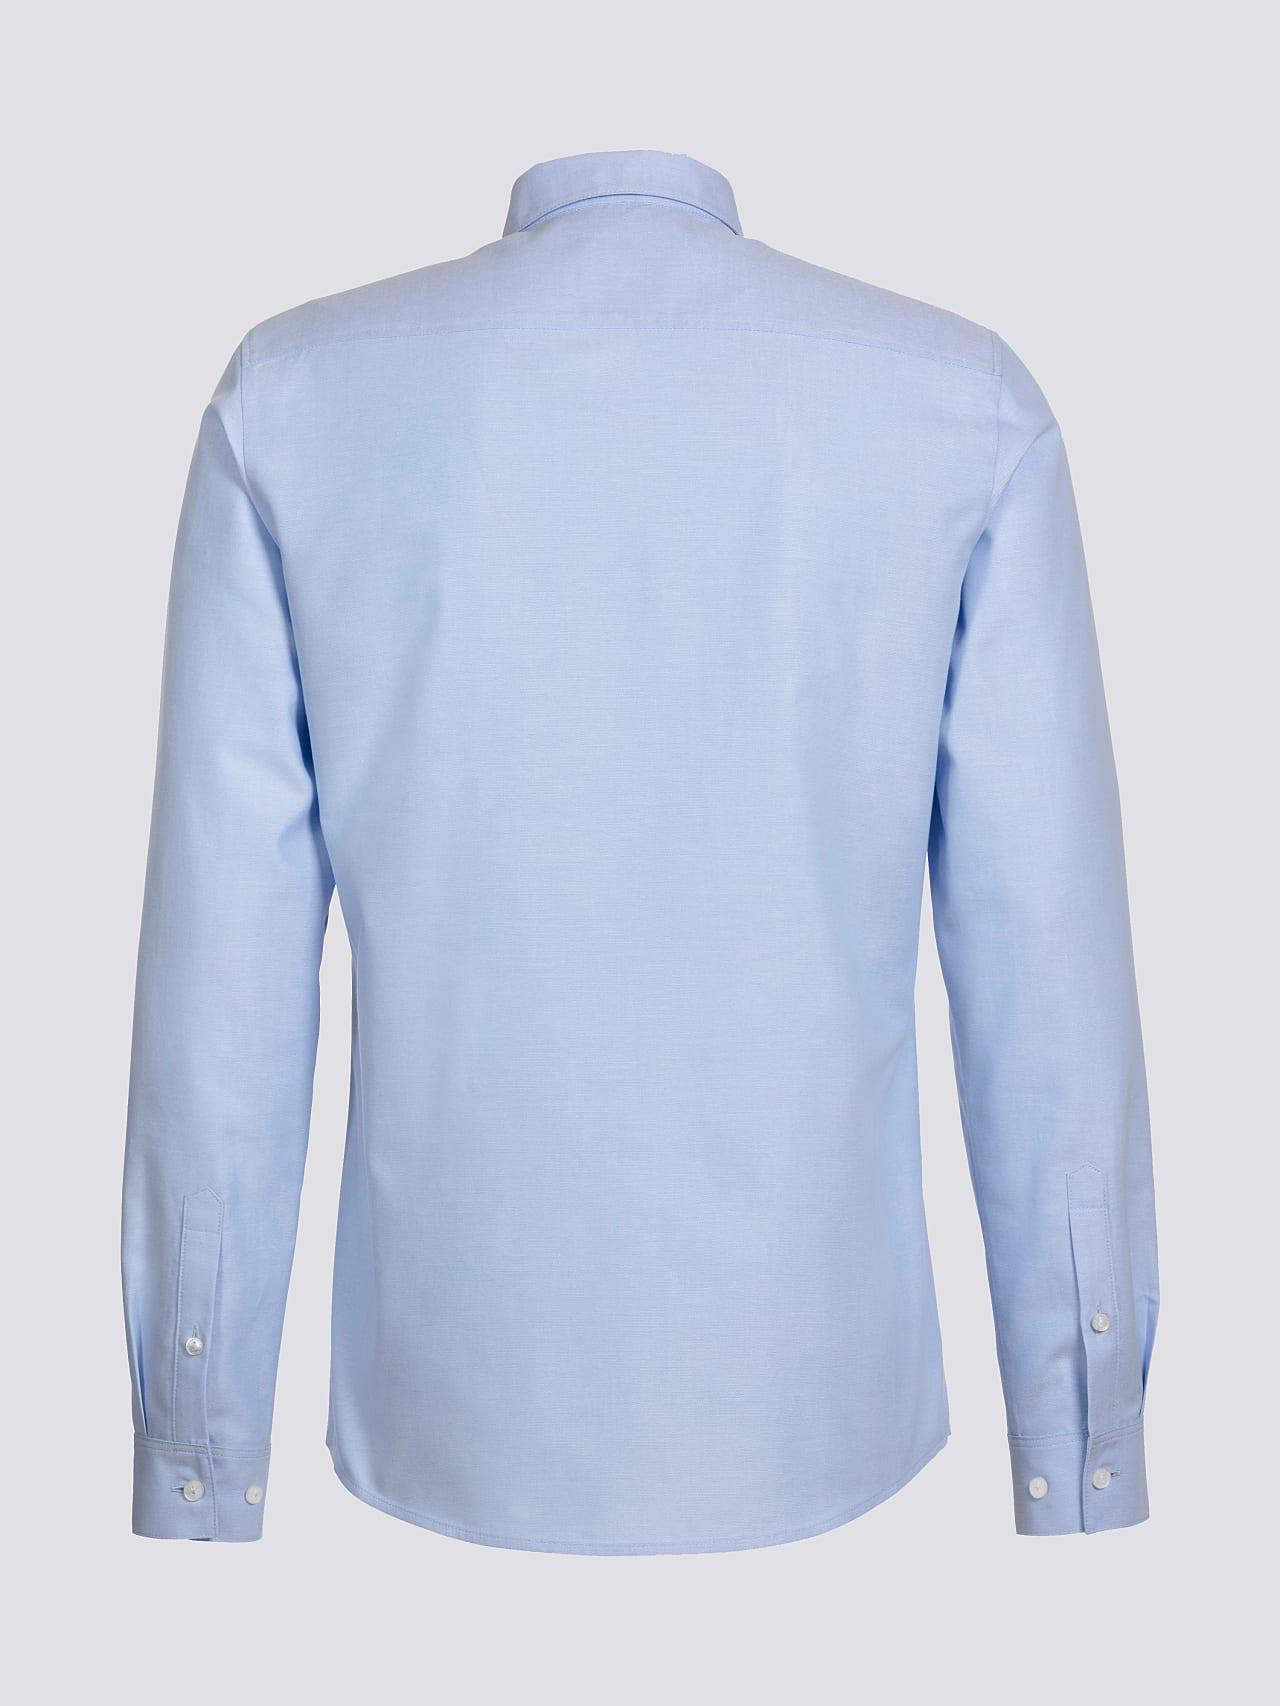 WOSKA V2.Y5.01 Kent Collar Oxford Shirt light blue Left Alpha Tauri